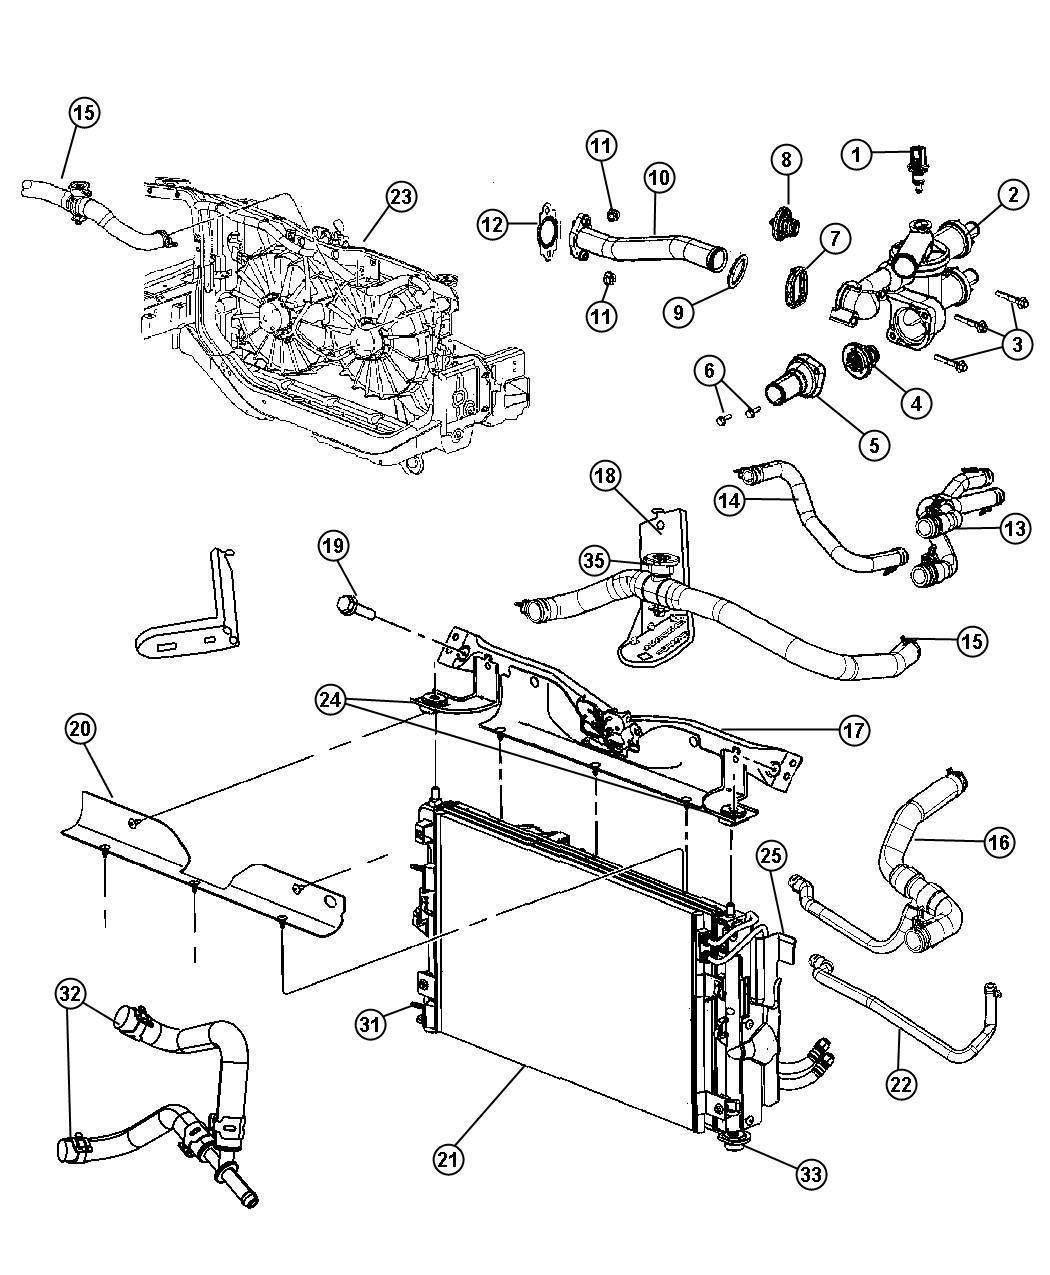 Jeep patriot 2010 manual coolant